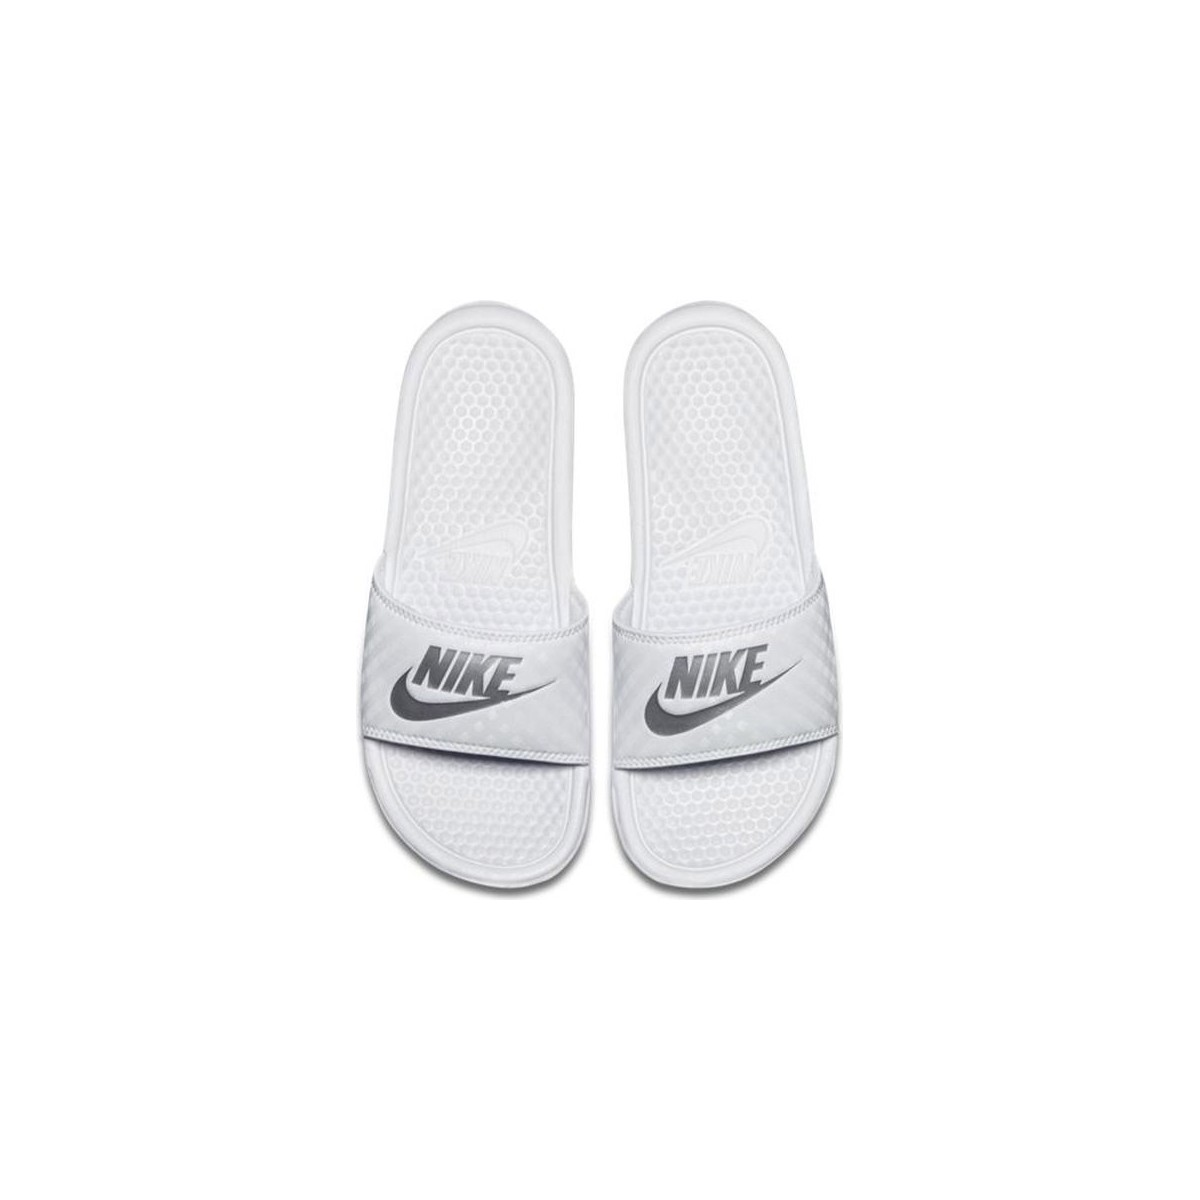 Ofertas Chanclas Venta Jdi 102 Mujer Blancas Nike Benassi 343881 De qxEPzwq06